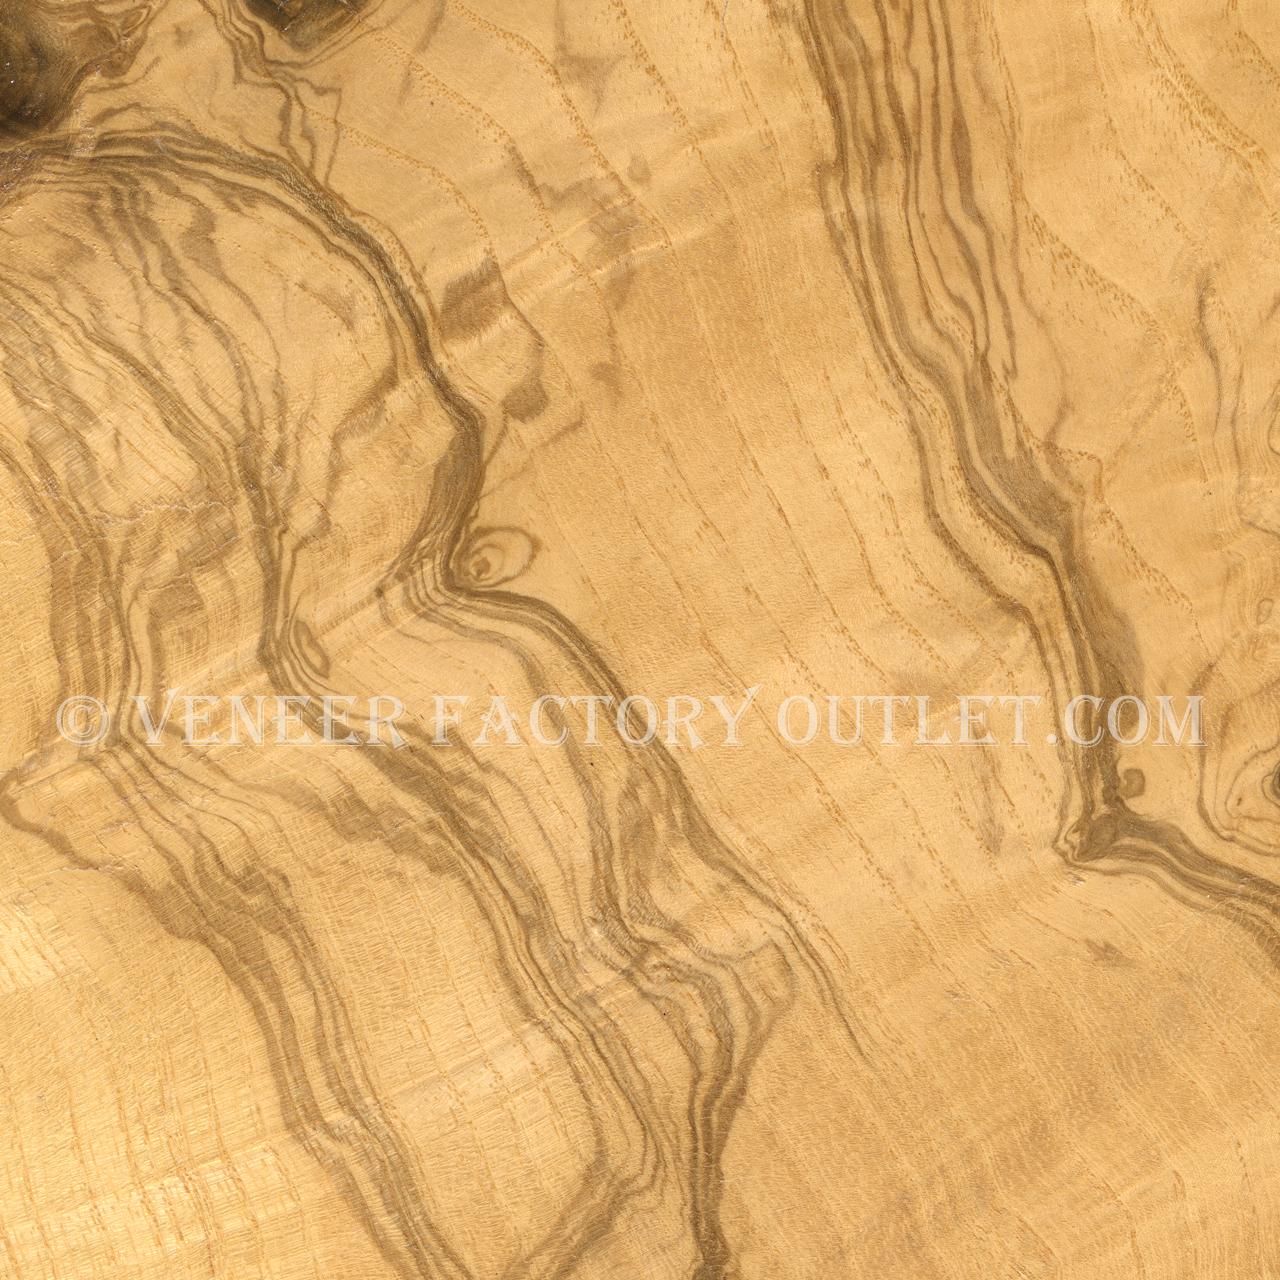 olive ash burl veneer savings olive ash burl veneer outlet com